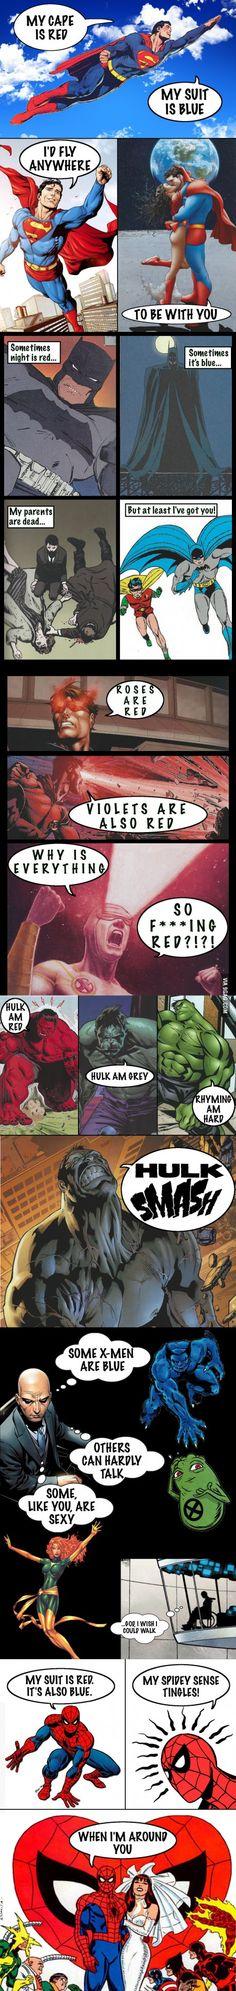 Superhero Valentines Cards - 9GAG